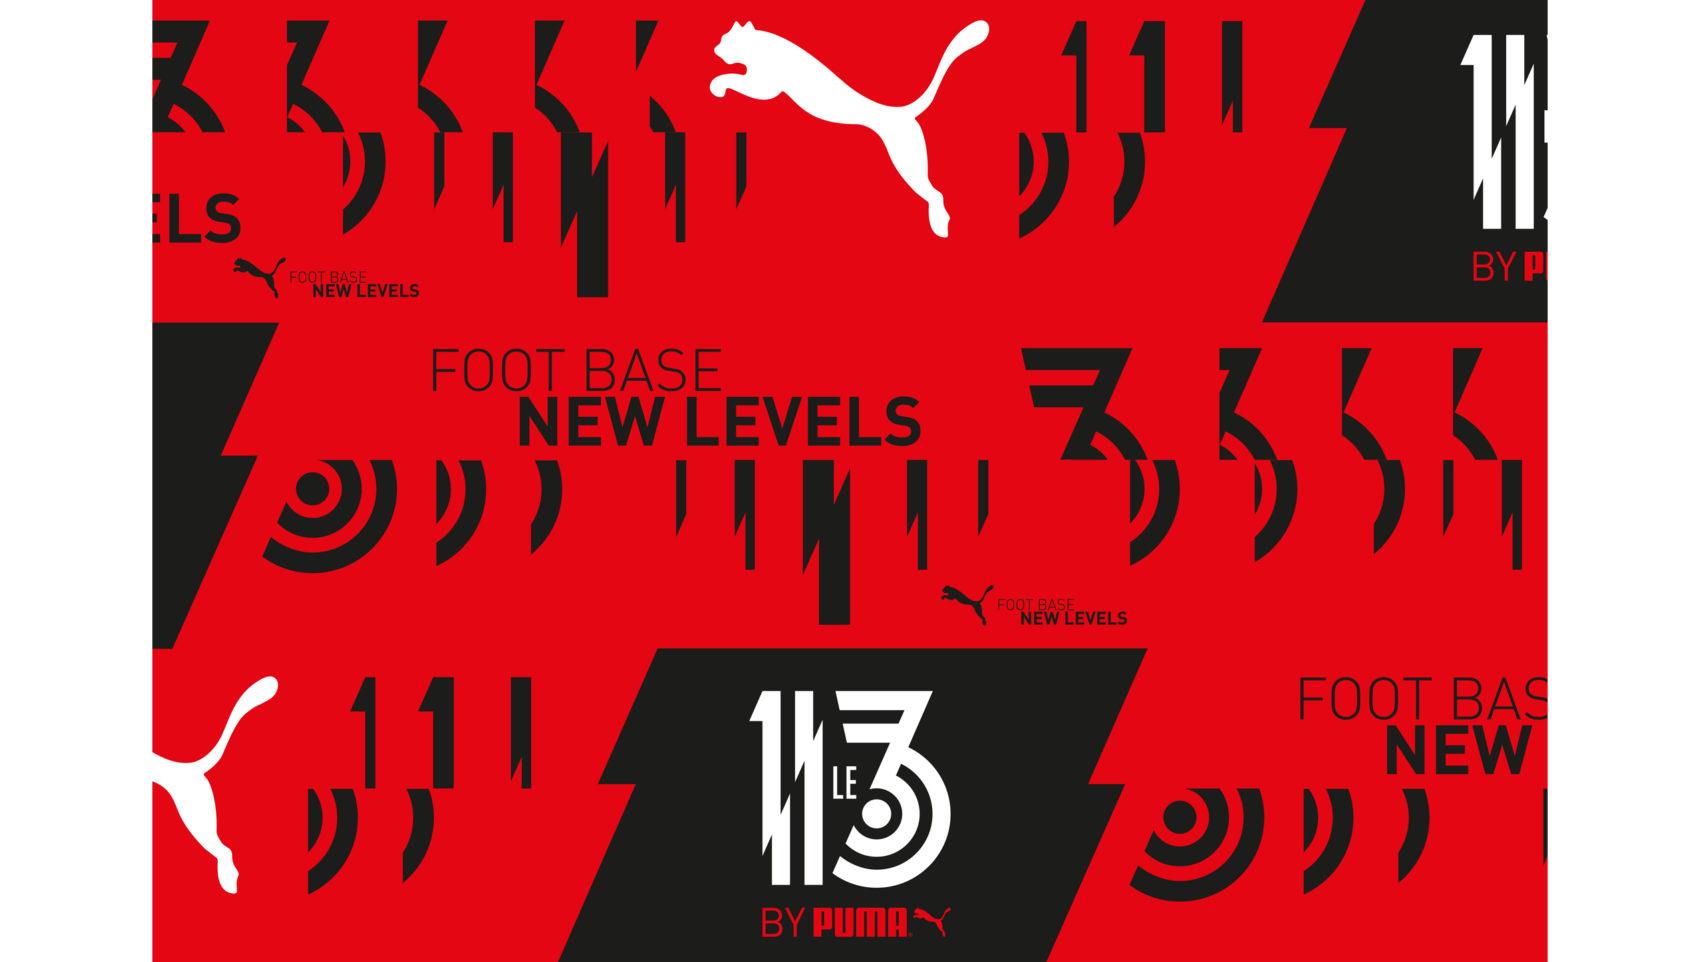 Projet_4_france_le_13_by_Puma_marseille_new_levels_sport_rap